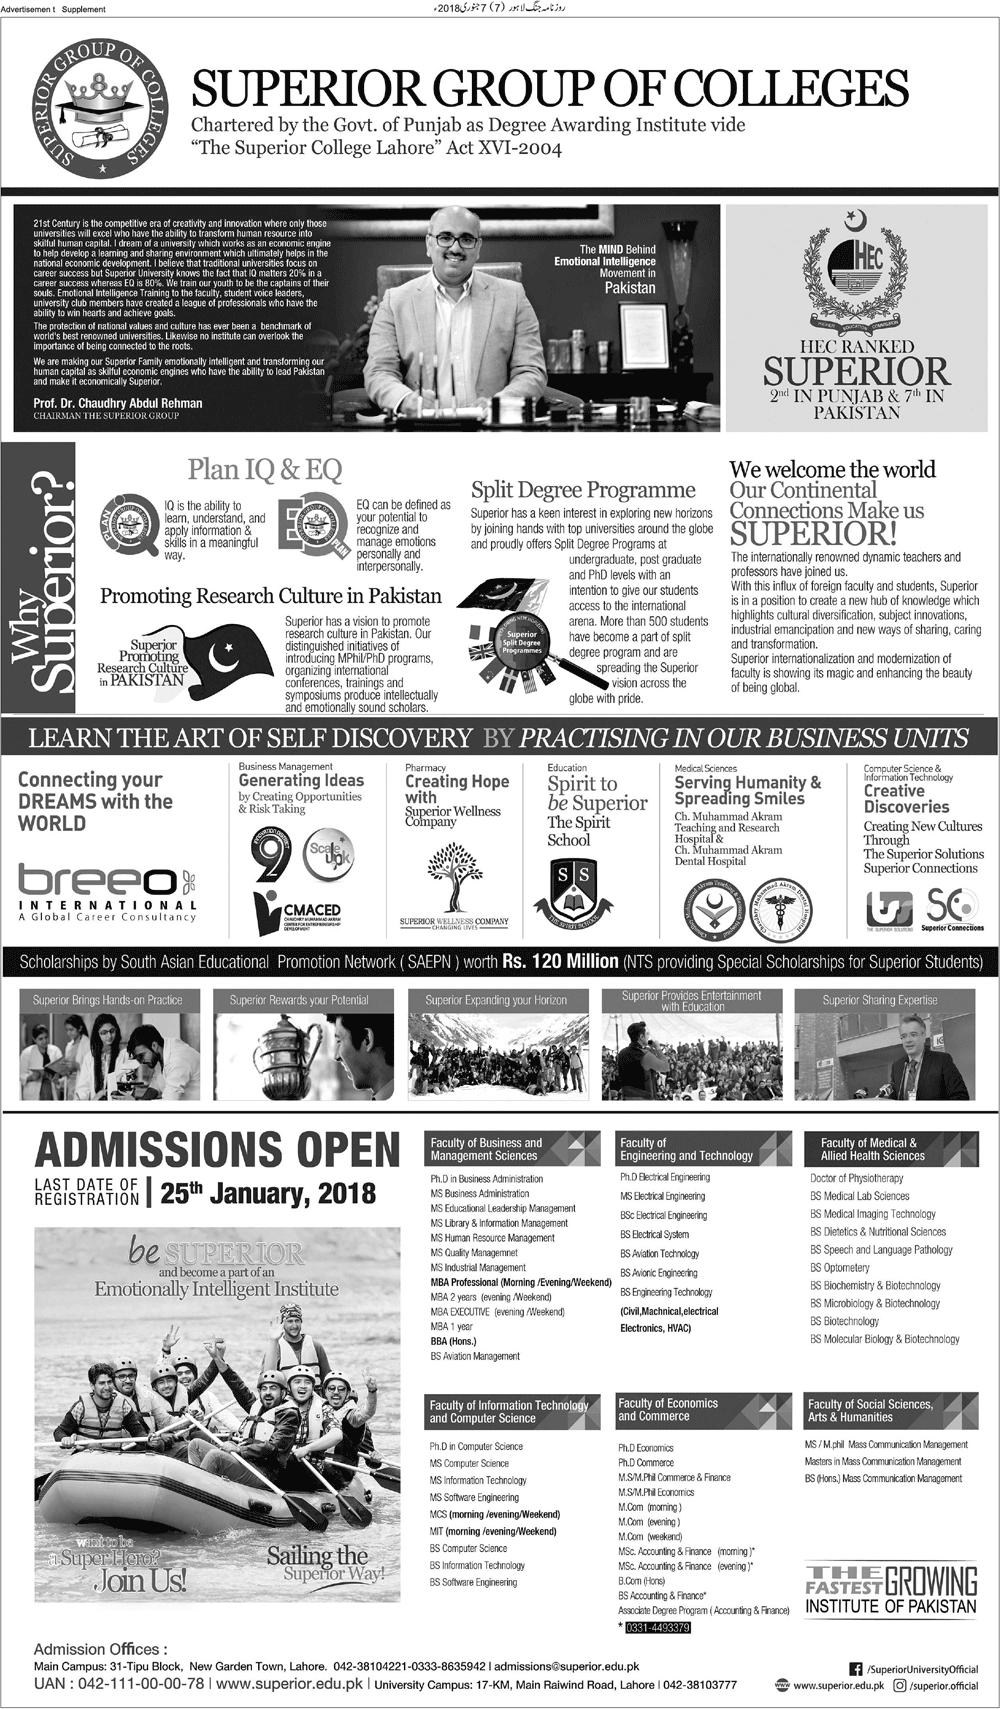 Superior University Lahore Admissions 2018 Form Procedure, Eligibility